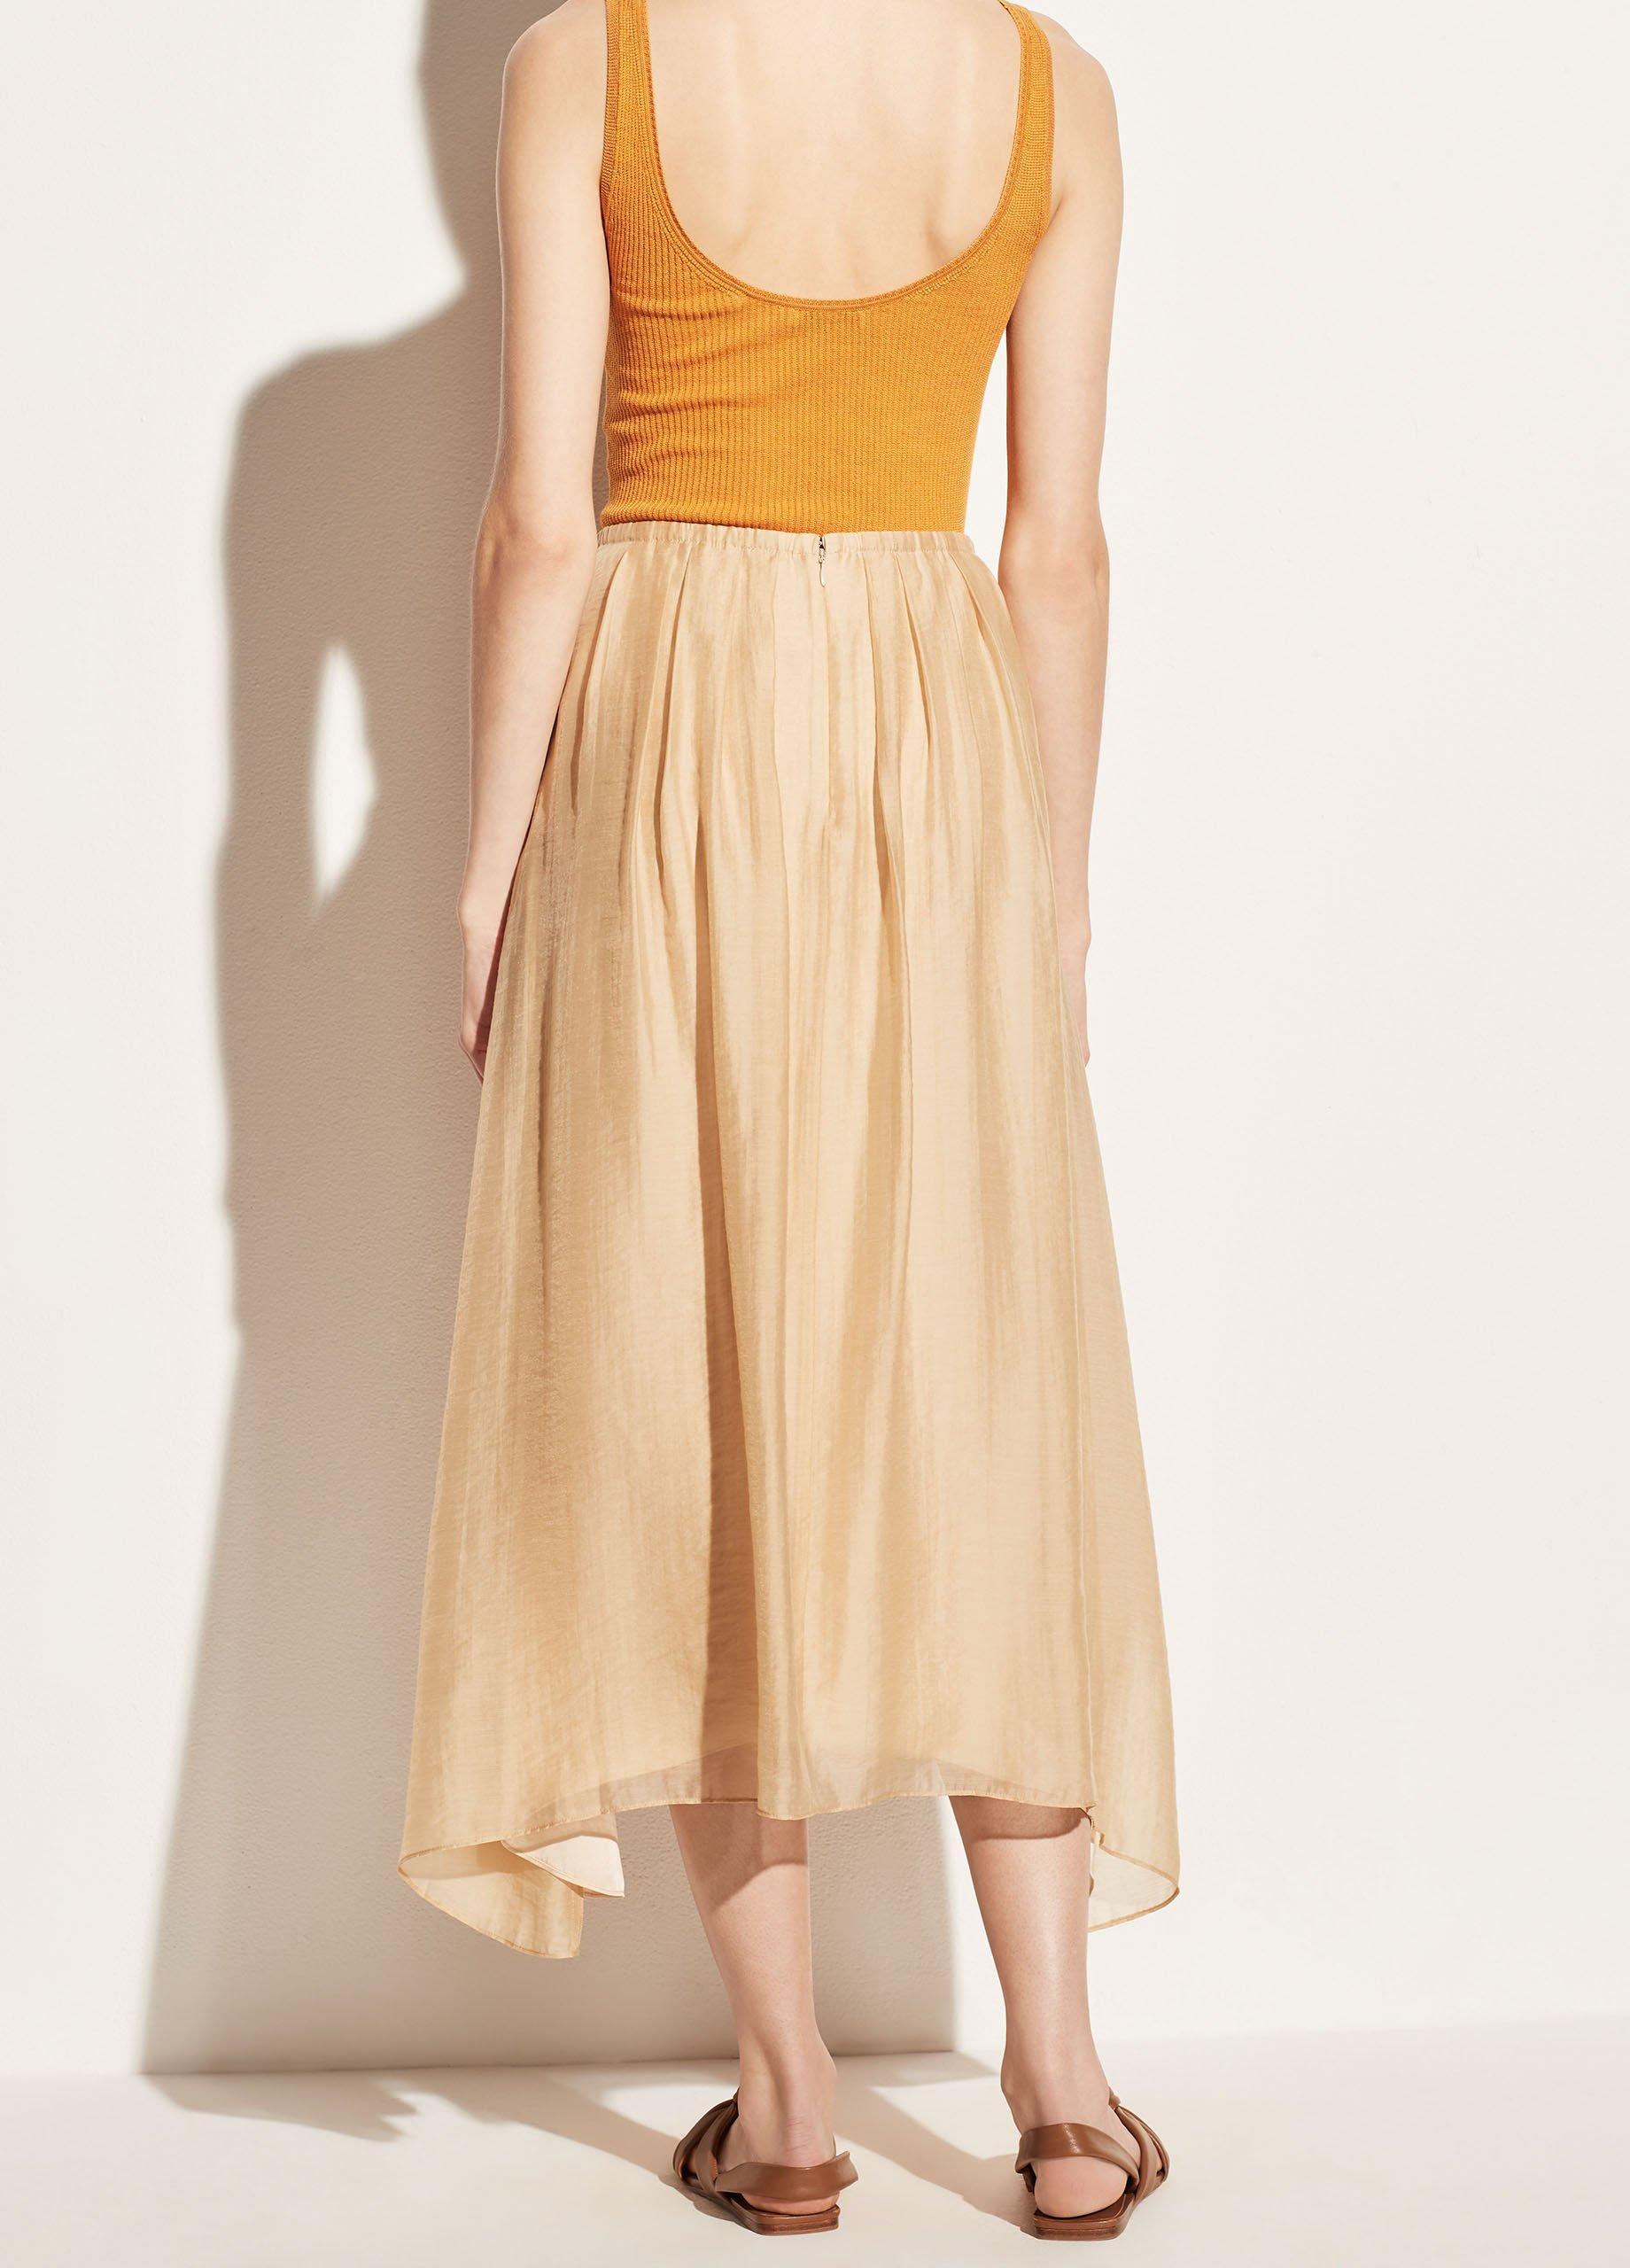 Gathered Pull On Skirt